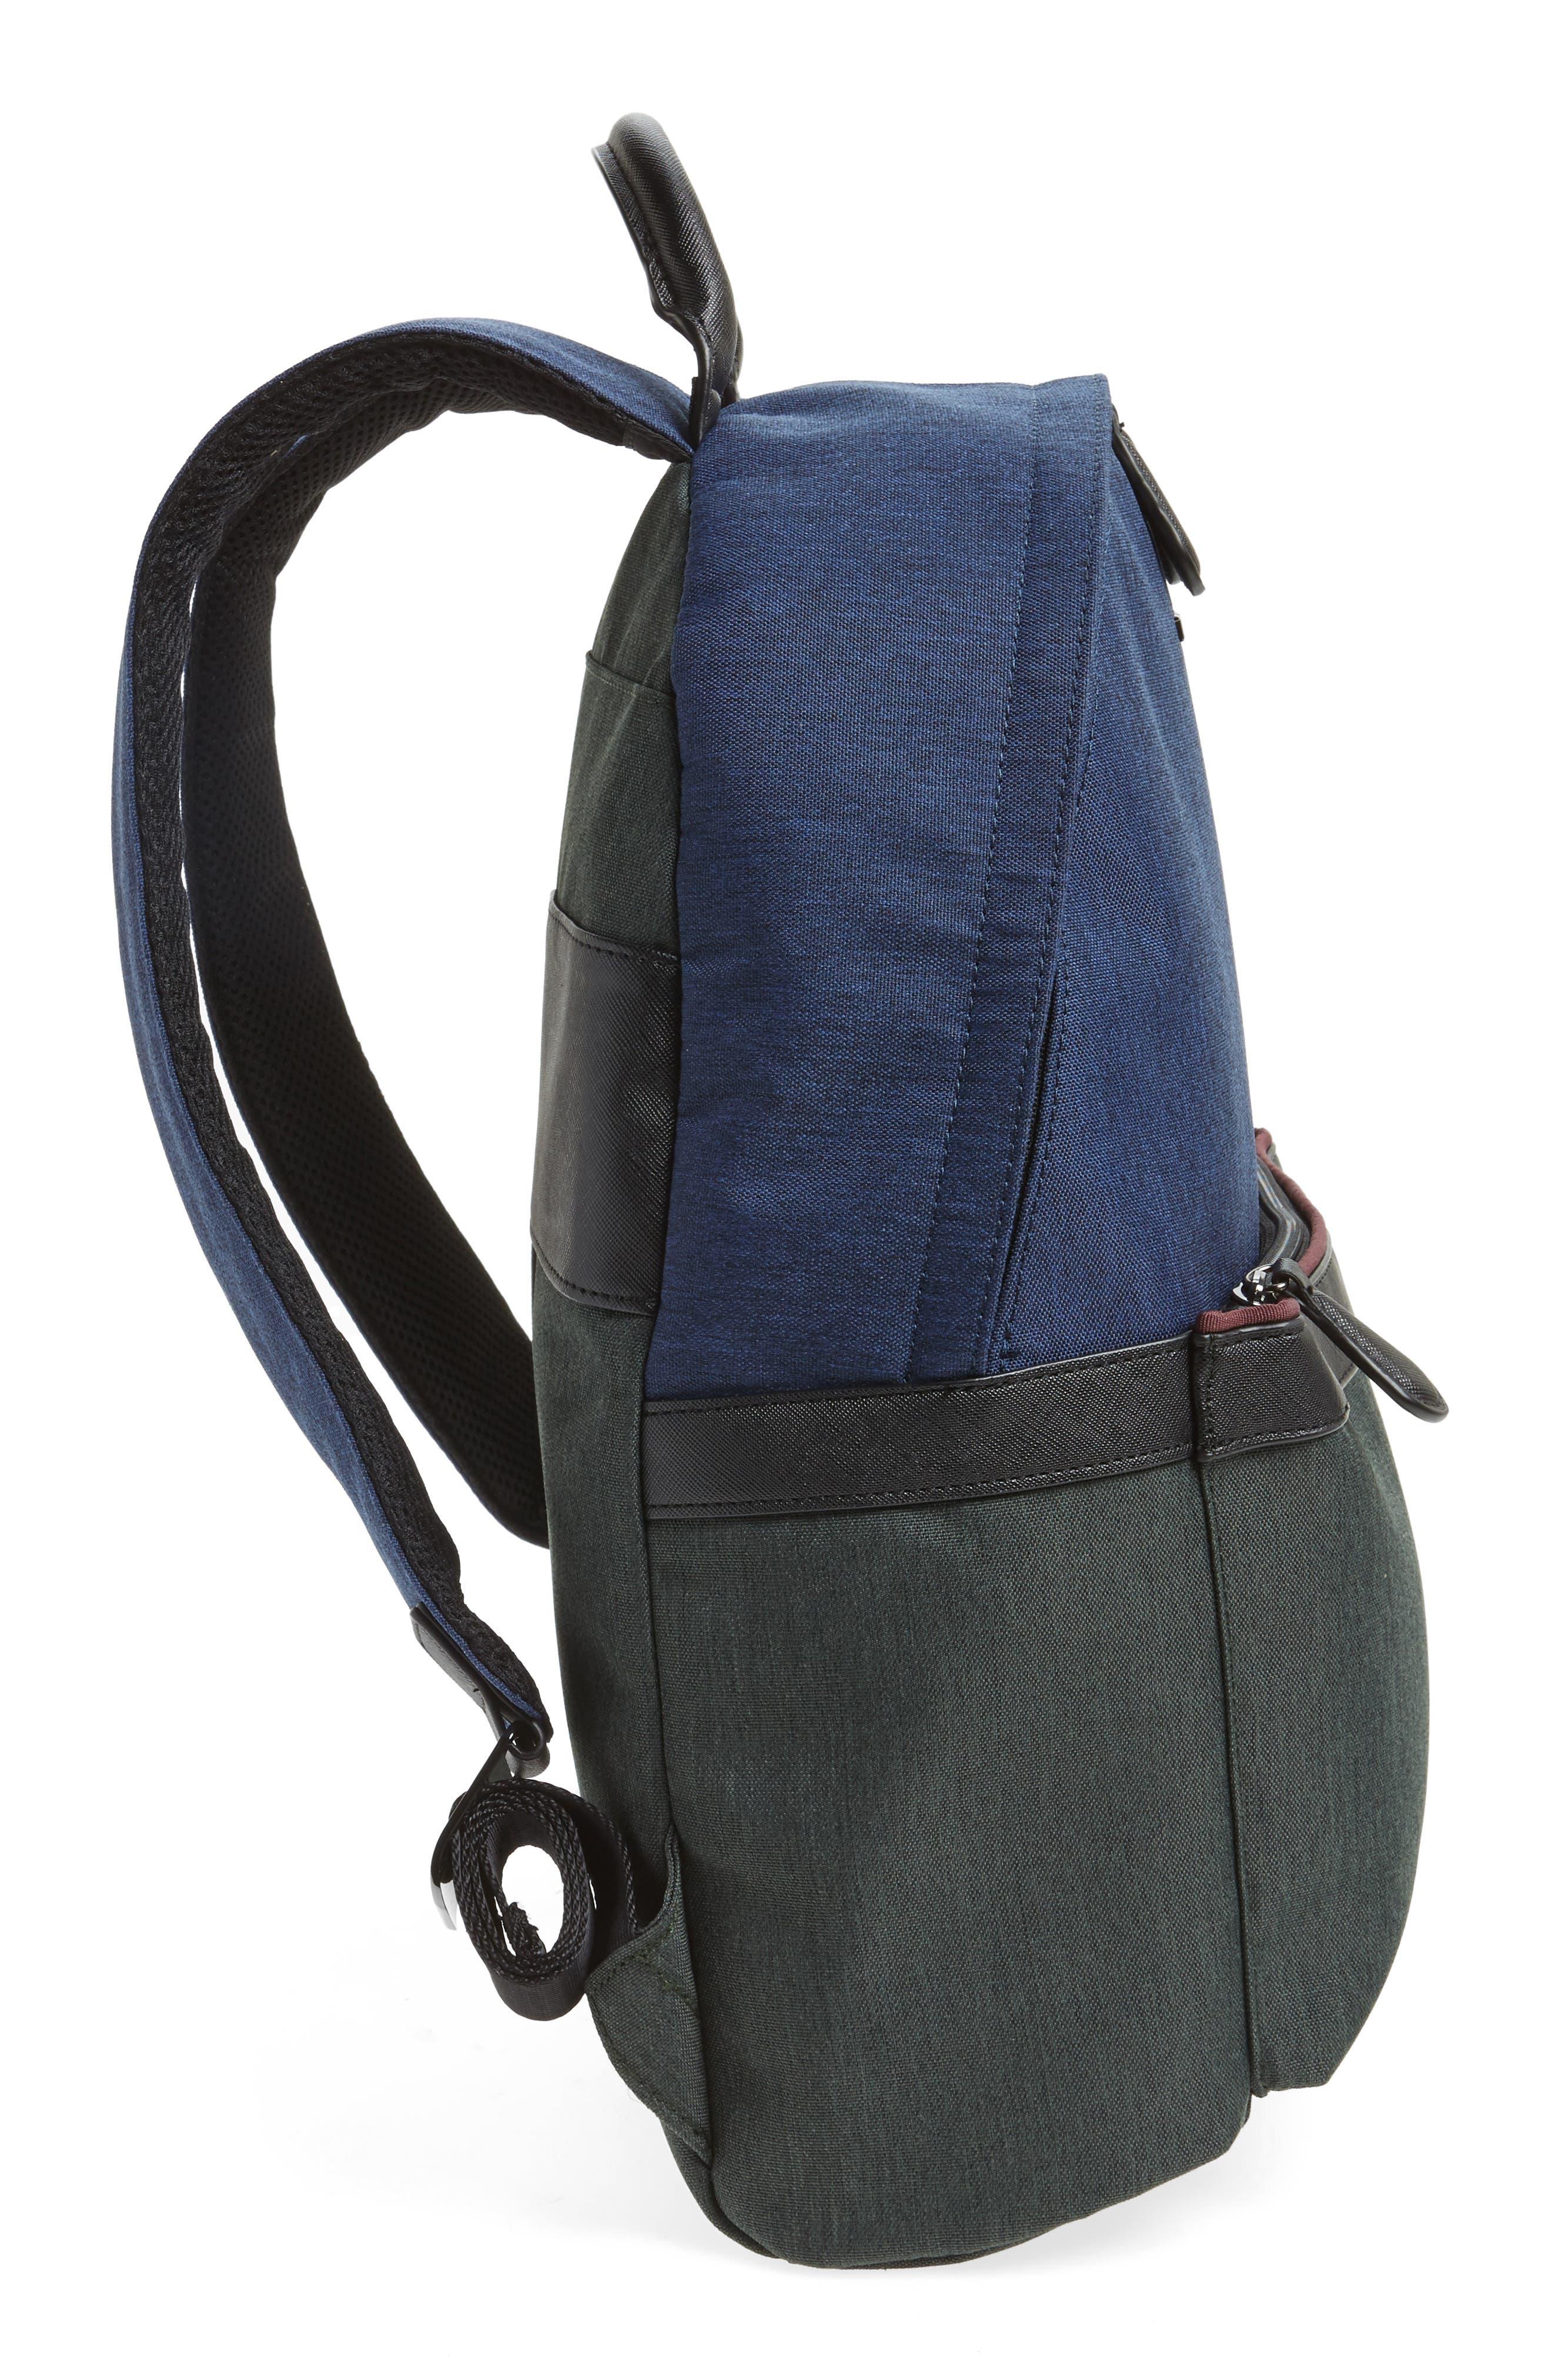 Zirabi Backpack,                             Alternate thumbnail 10, color,